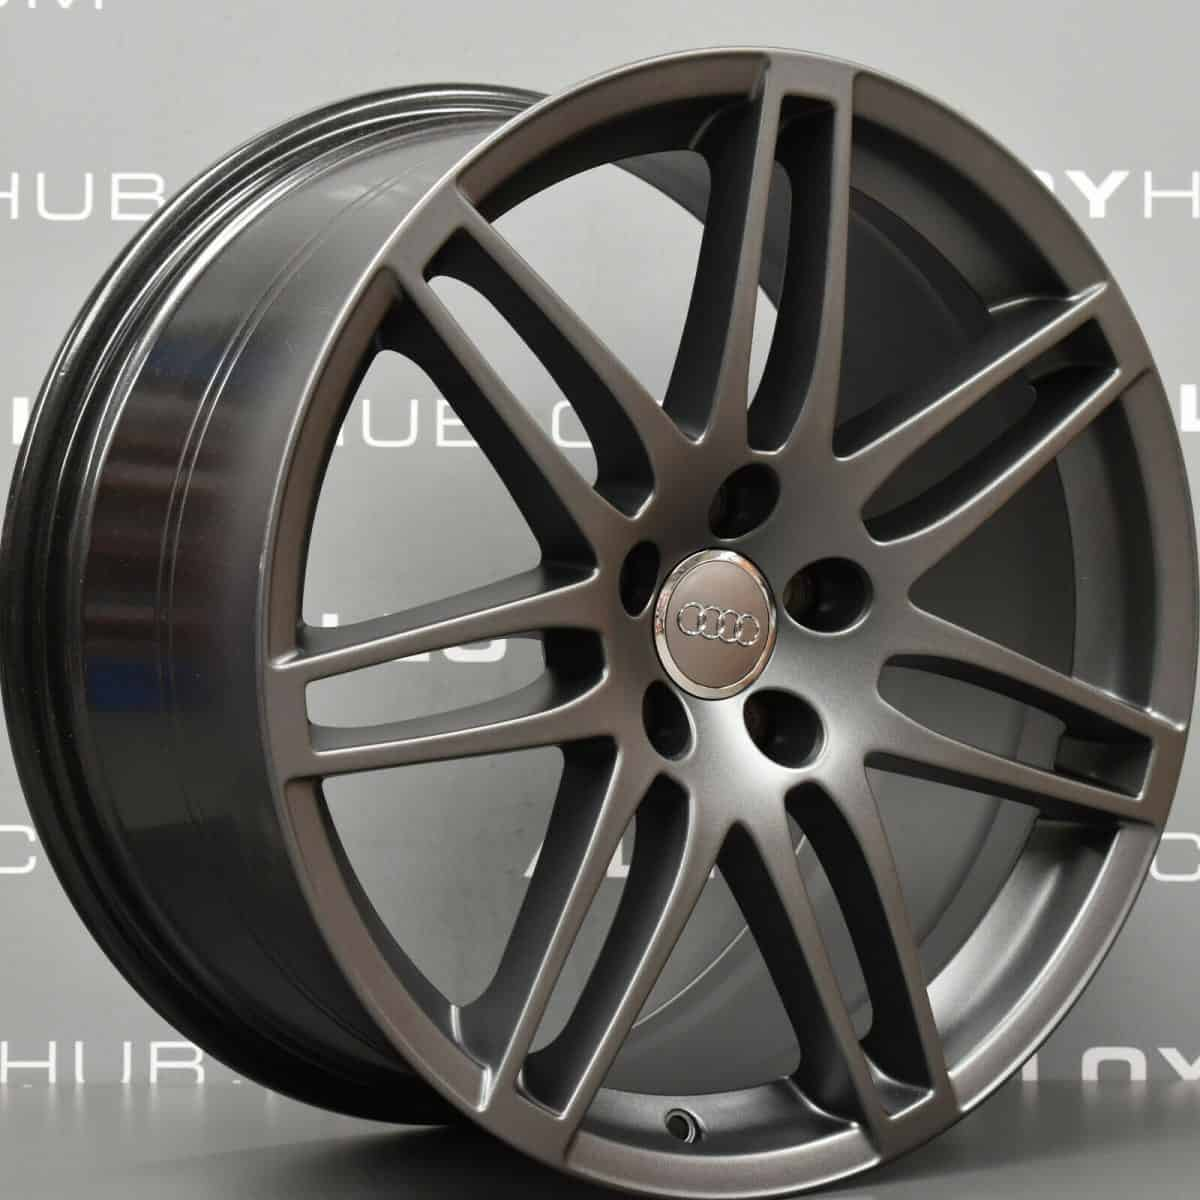 "Genuine Audi TT/TTS 8J MK2 19"" Inch 7 Double Spoke S-Line Black Edition RS4 Alloy Wheels with Satin Grey Finish 8J0 601 025 N"